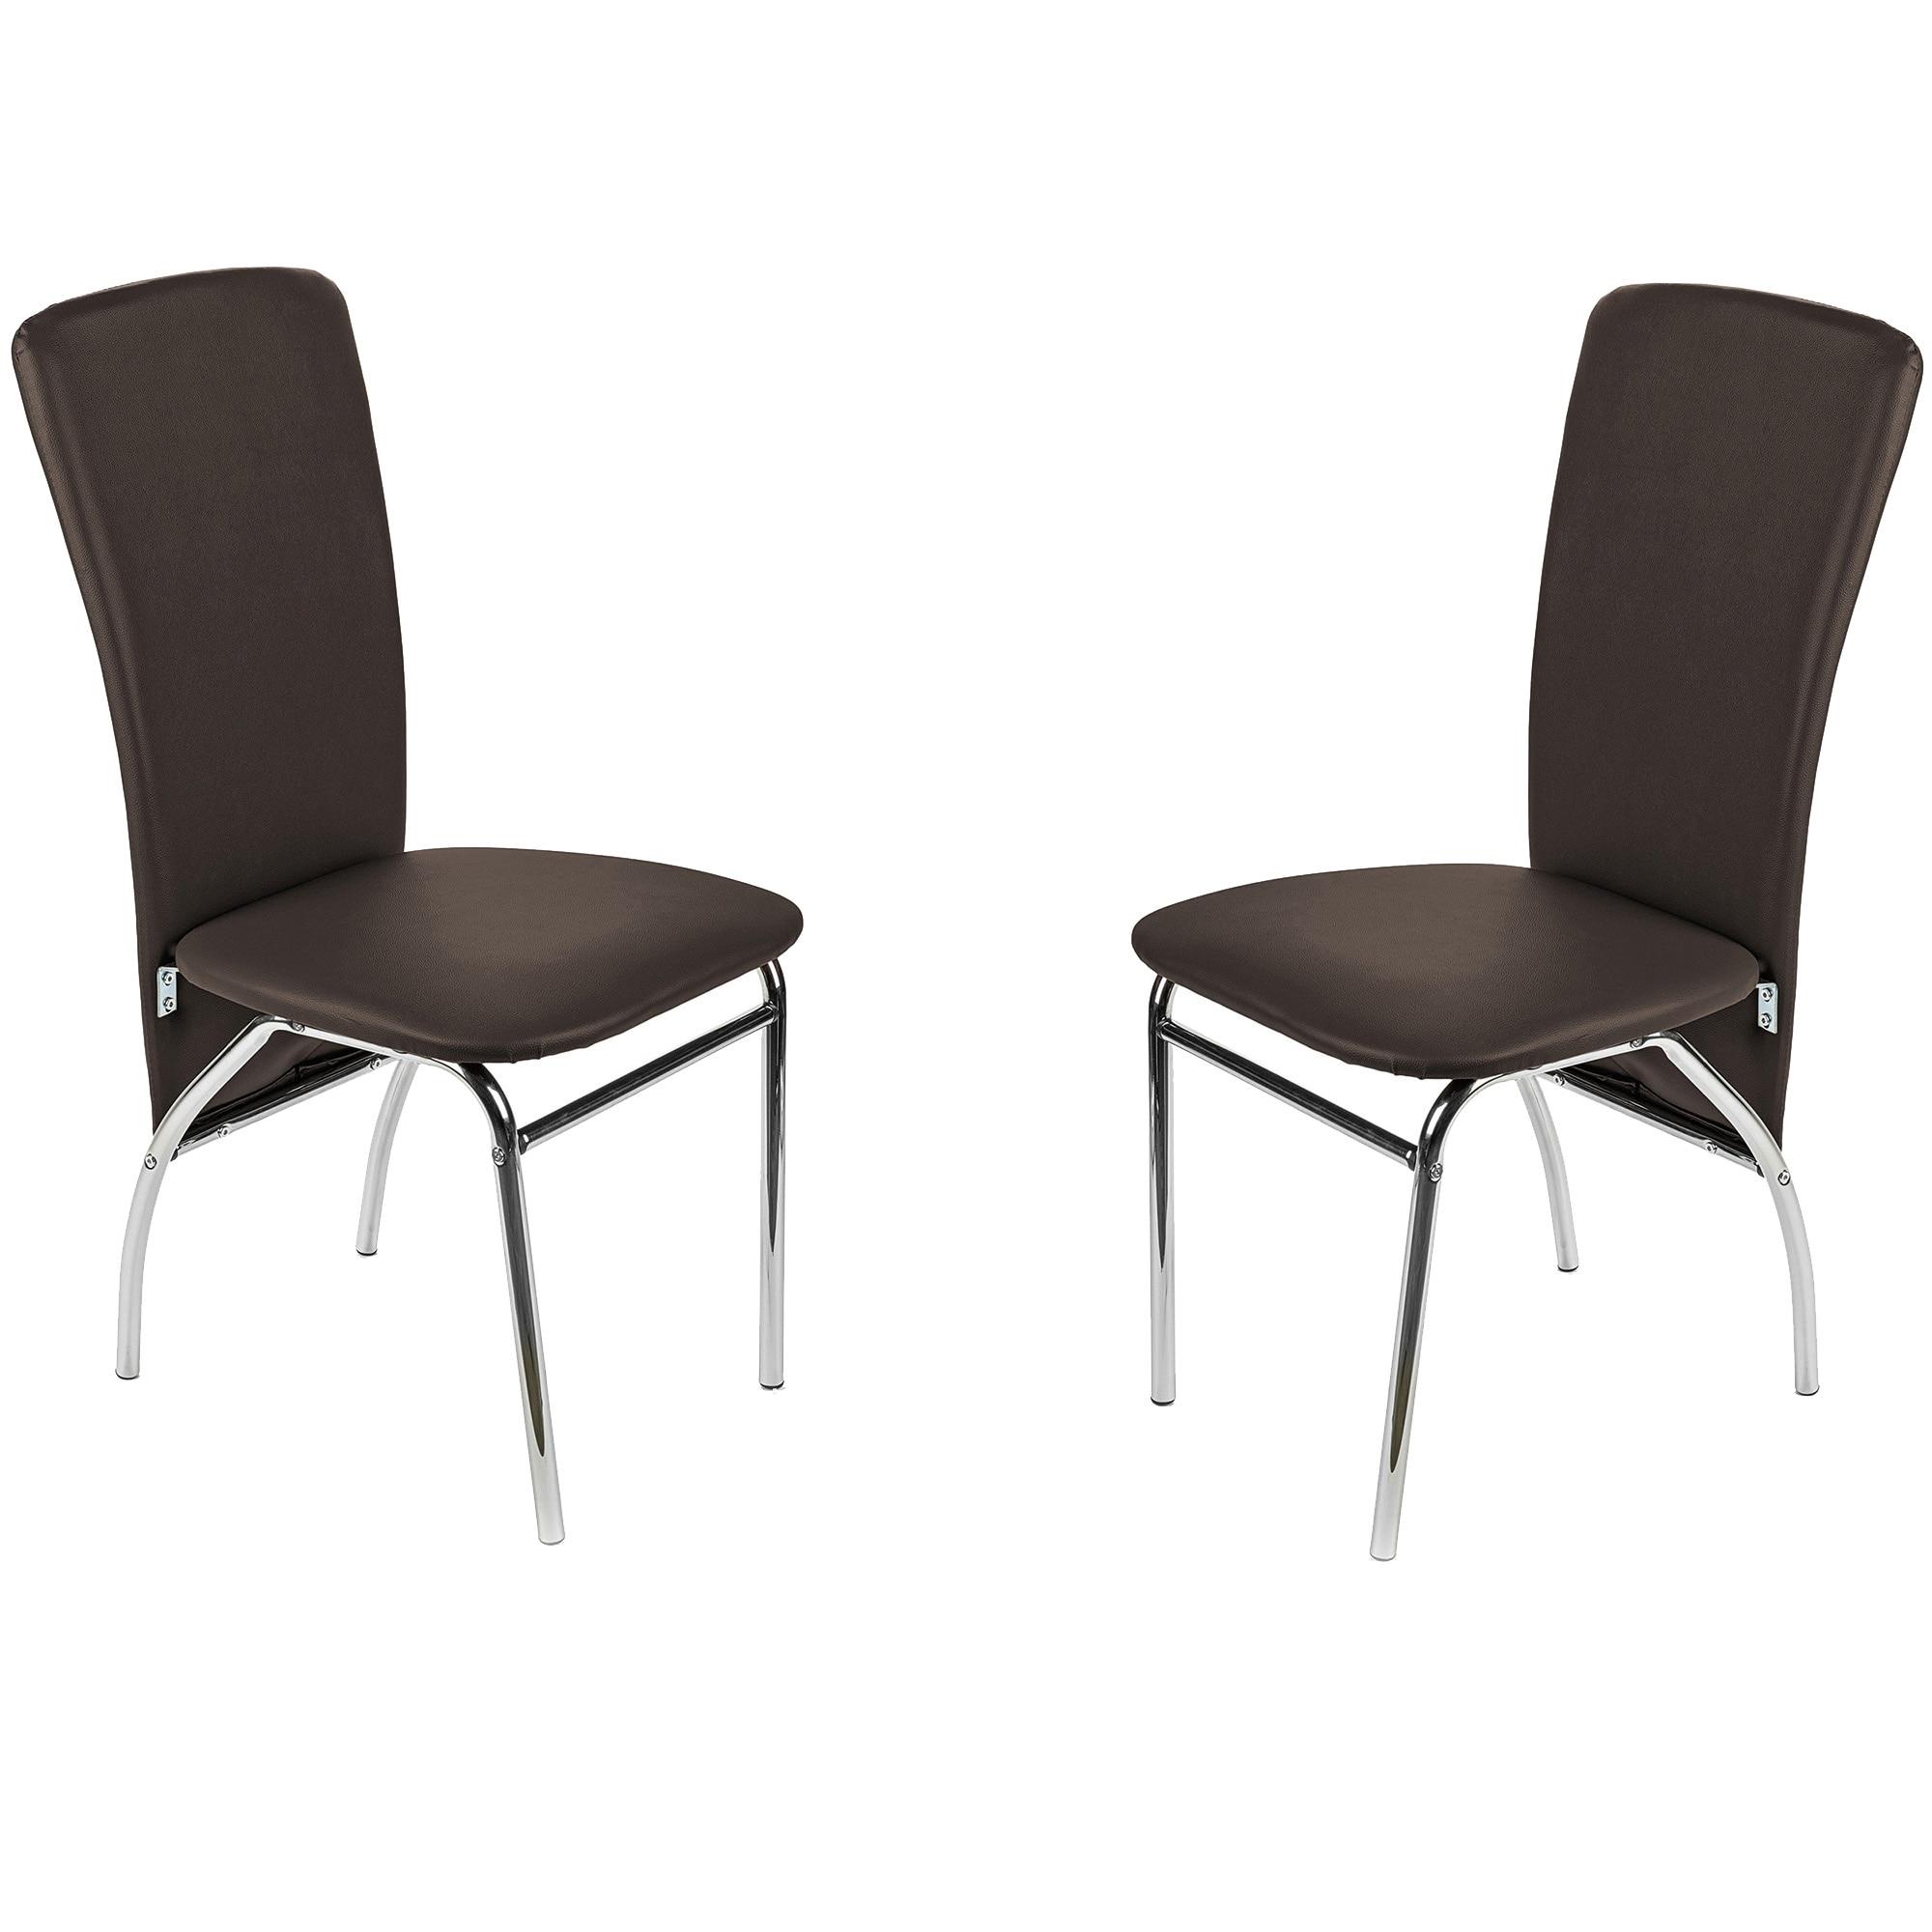 Fotografie Set 2 scaune dining / bucatarie Kring Milano, Maro